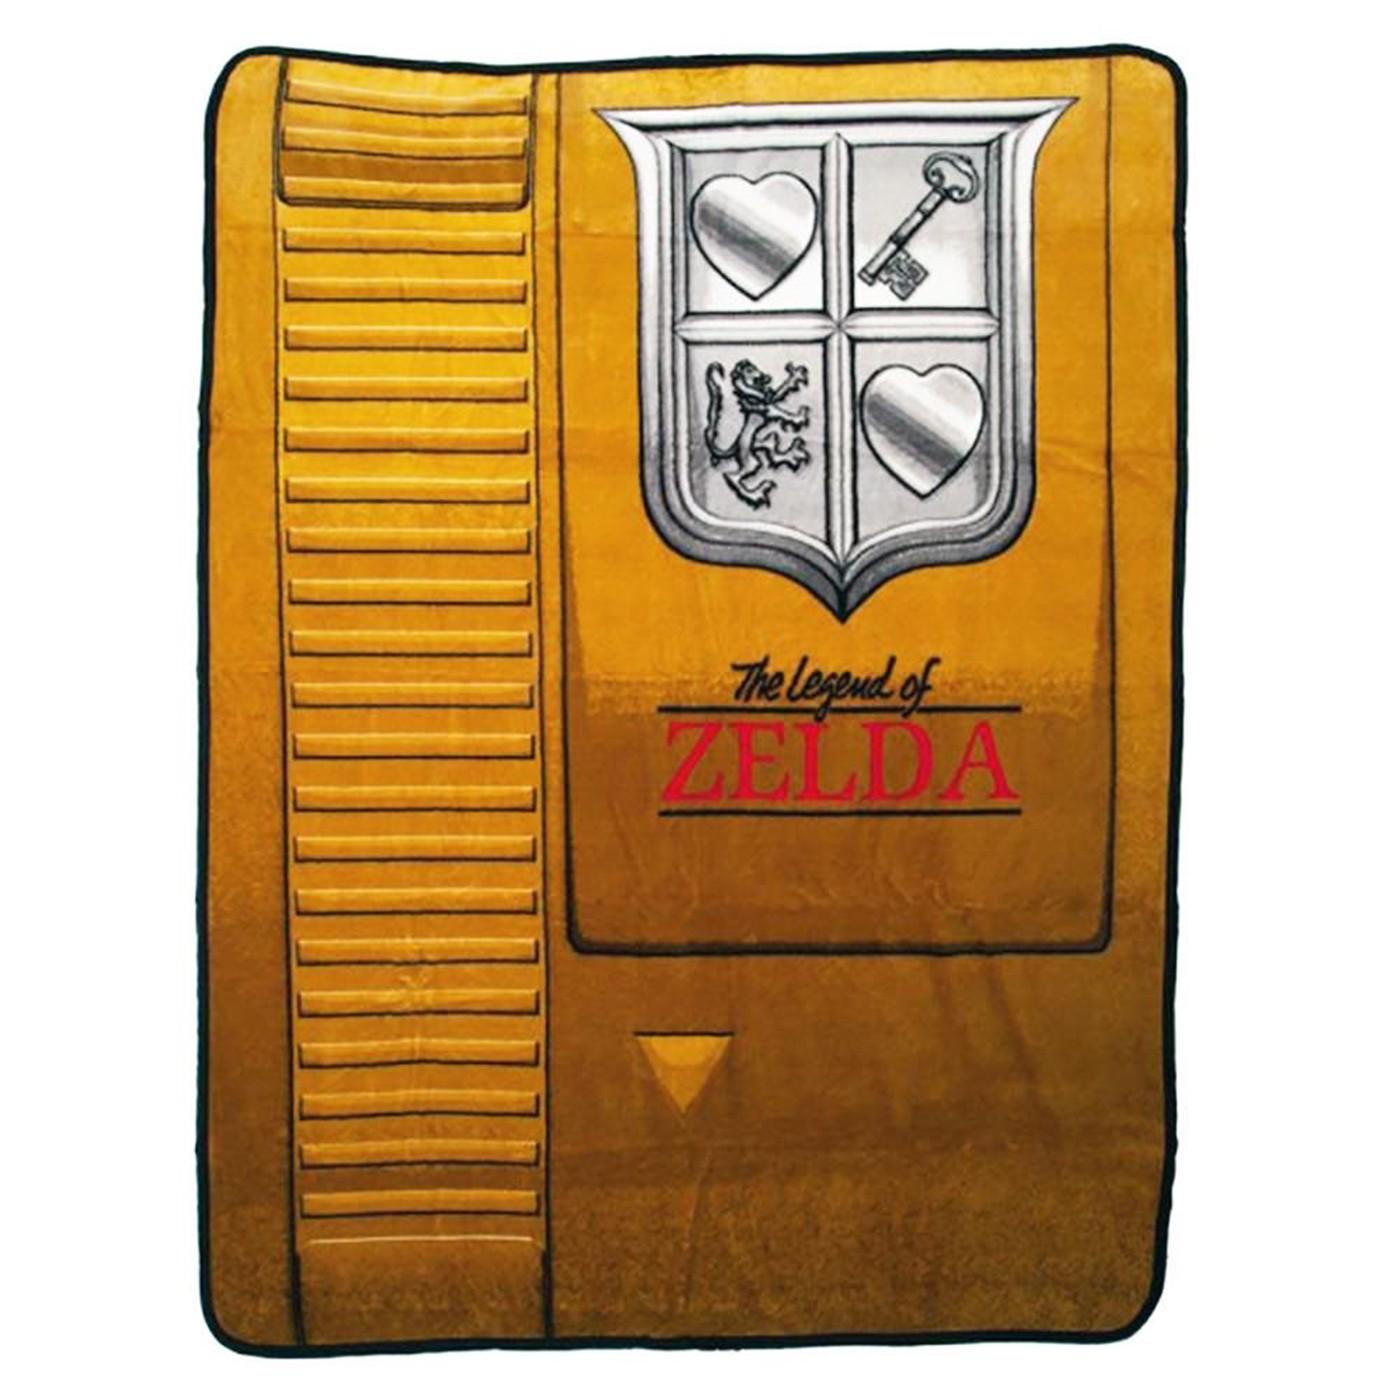 Nintendo Gold Cartridge 48 x 60 in. Digital Fleece Throw